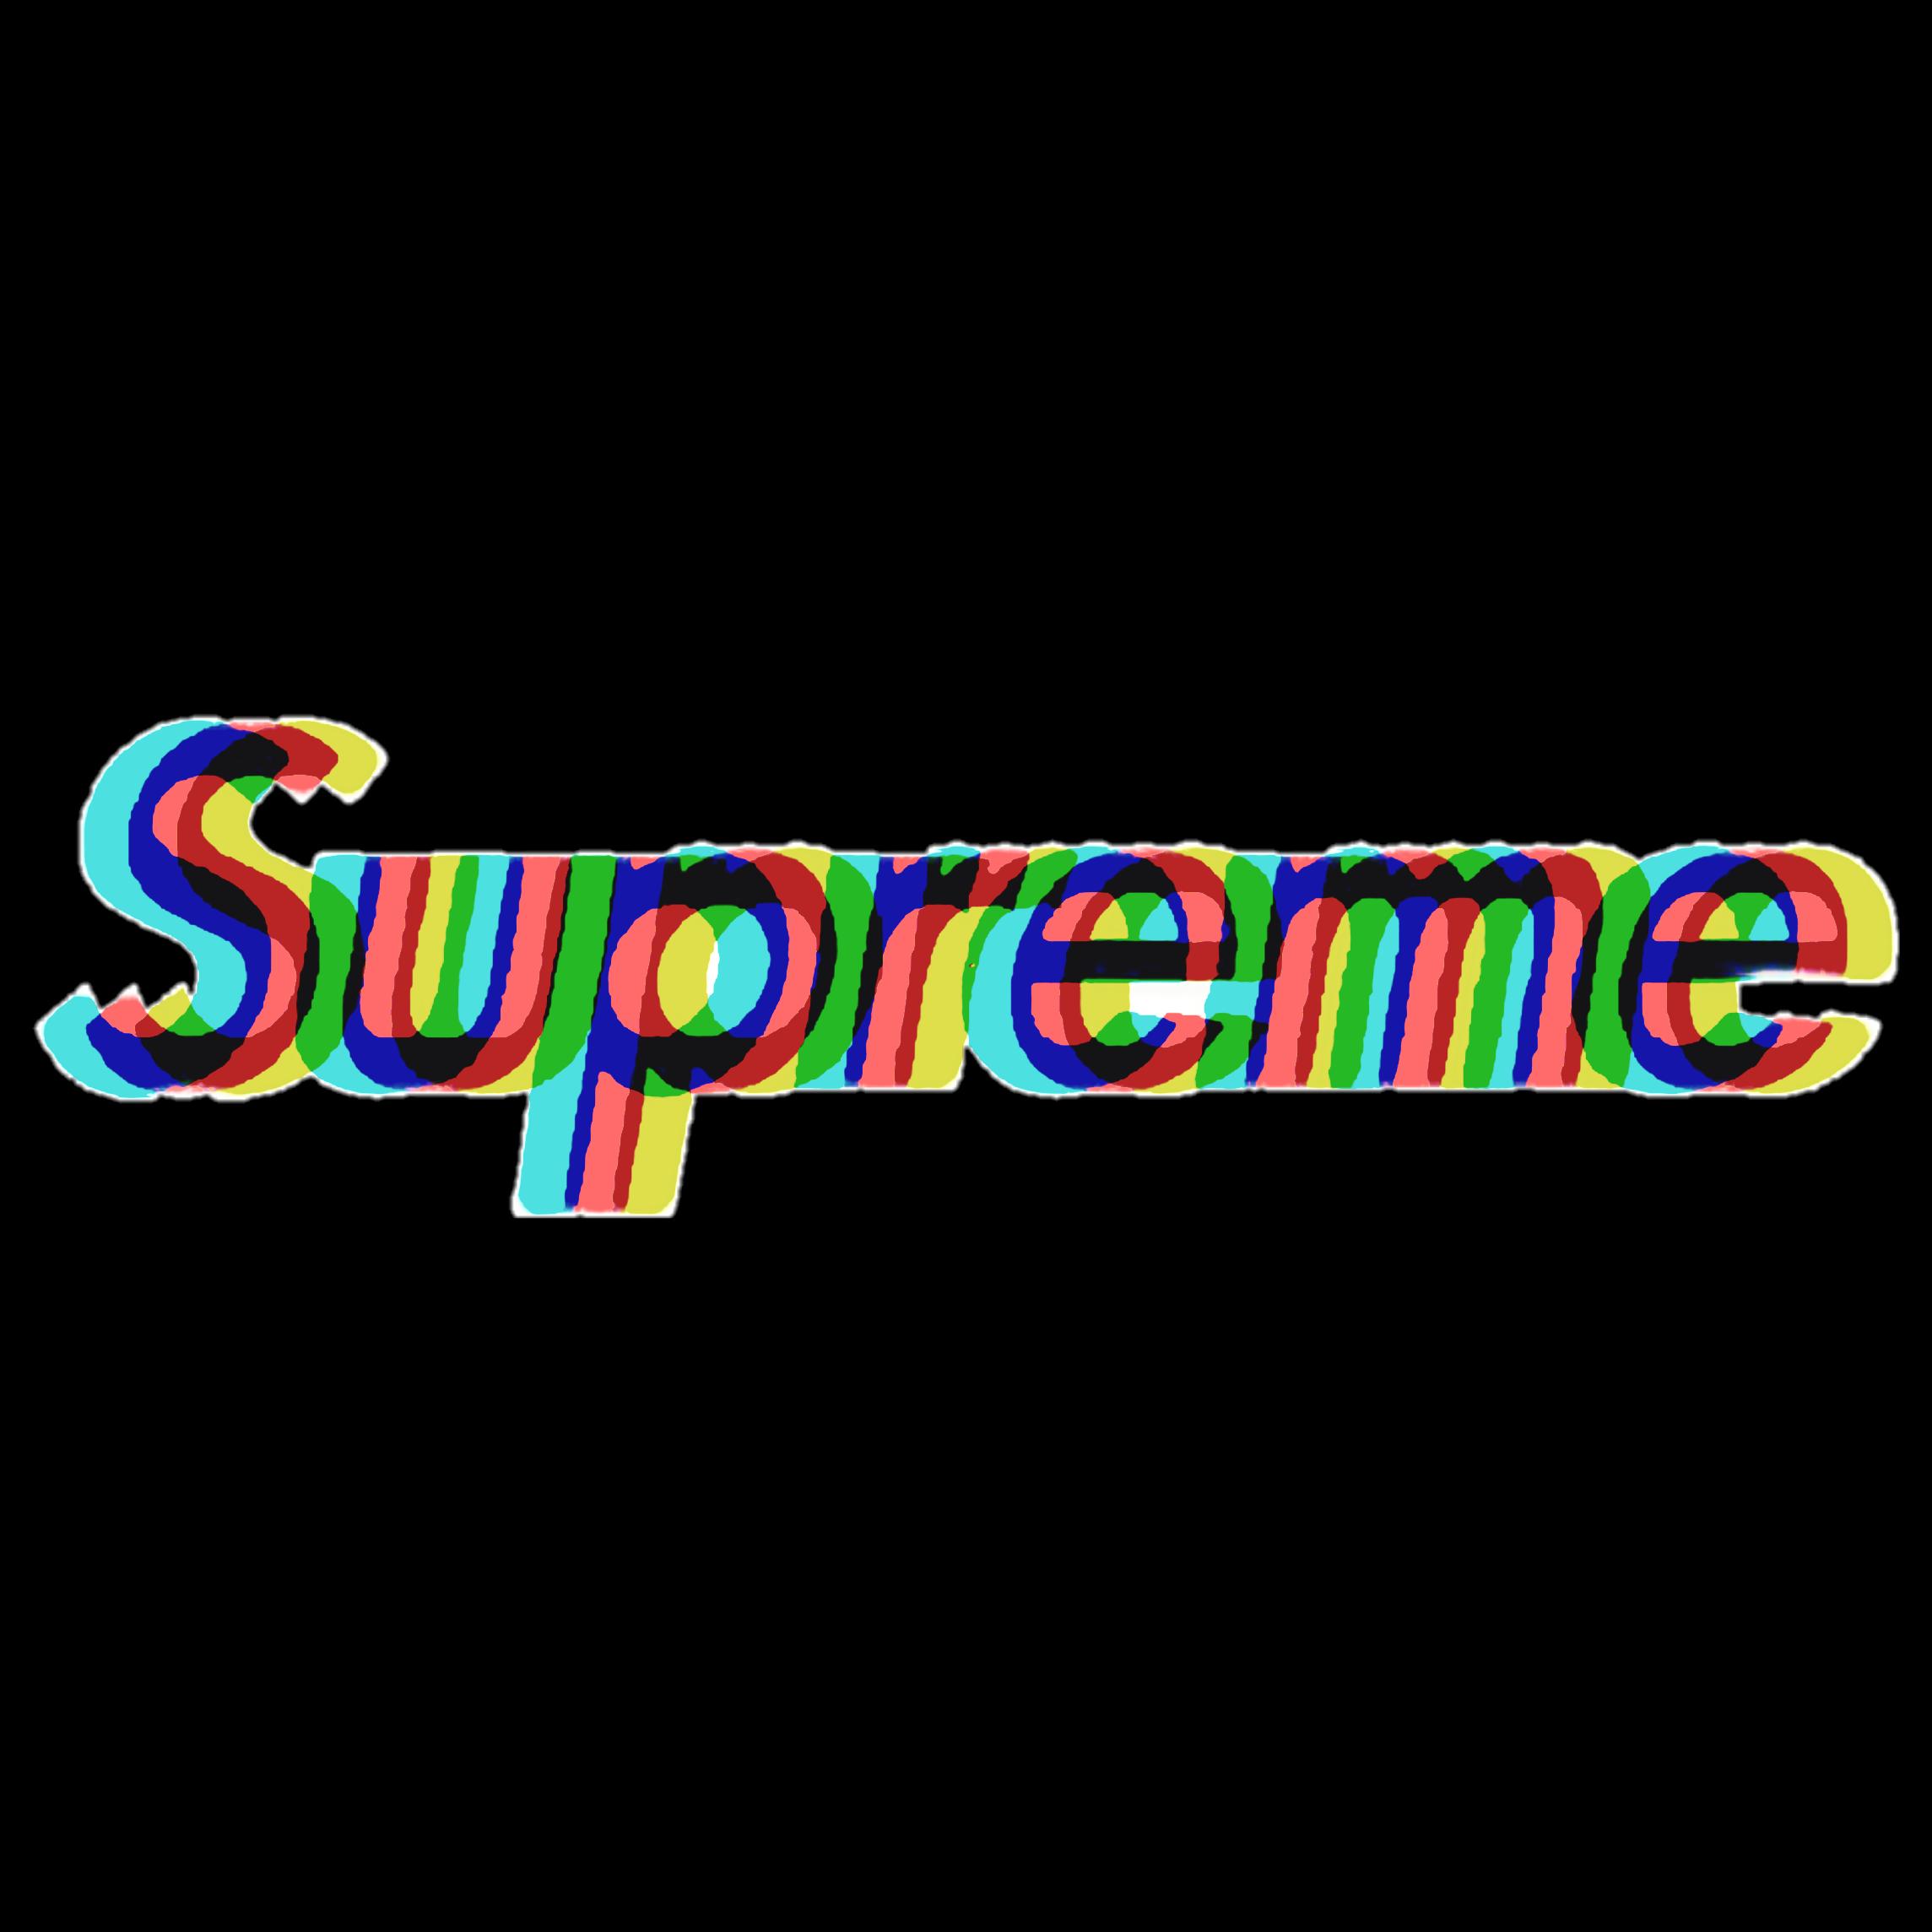 Freetoedit Supreme Memezasf Motionblurr Glitch Glitcheffect Glitched Aesthetic Lit Korea Ba Theme Dividers Instagram Supreme Sticker Glitch Wallpaper